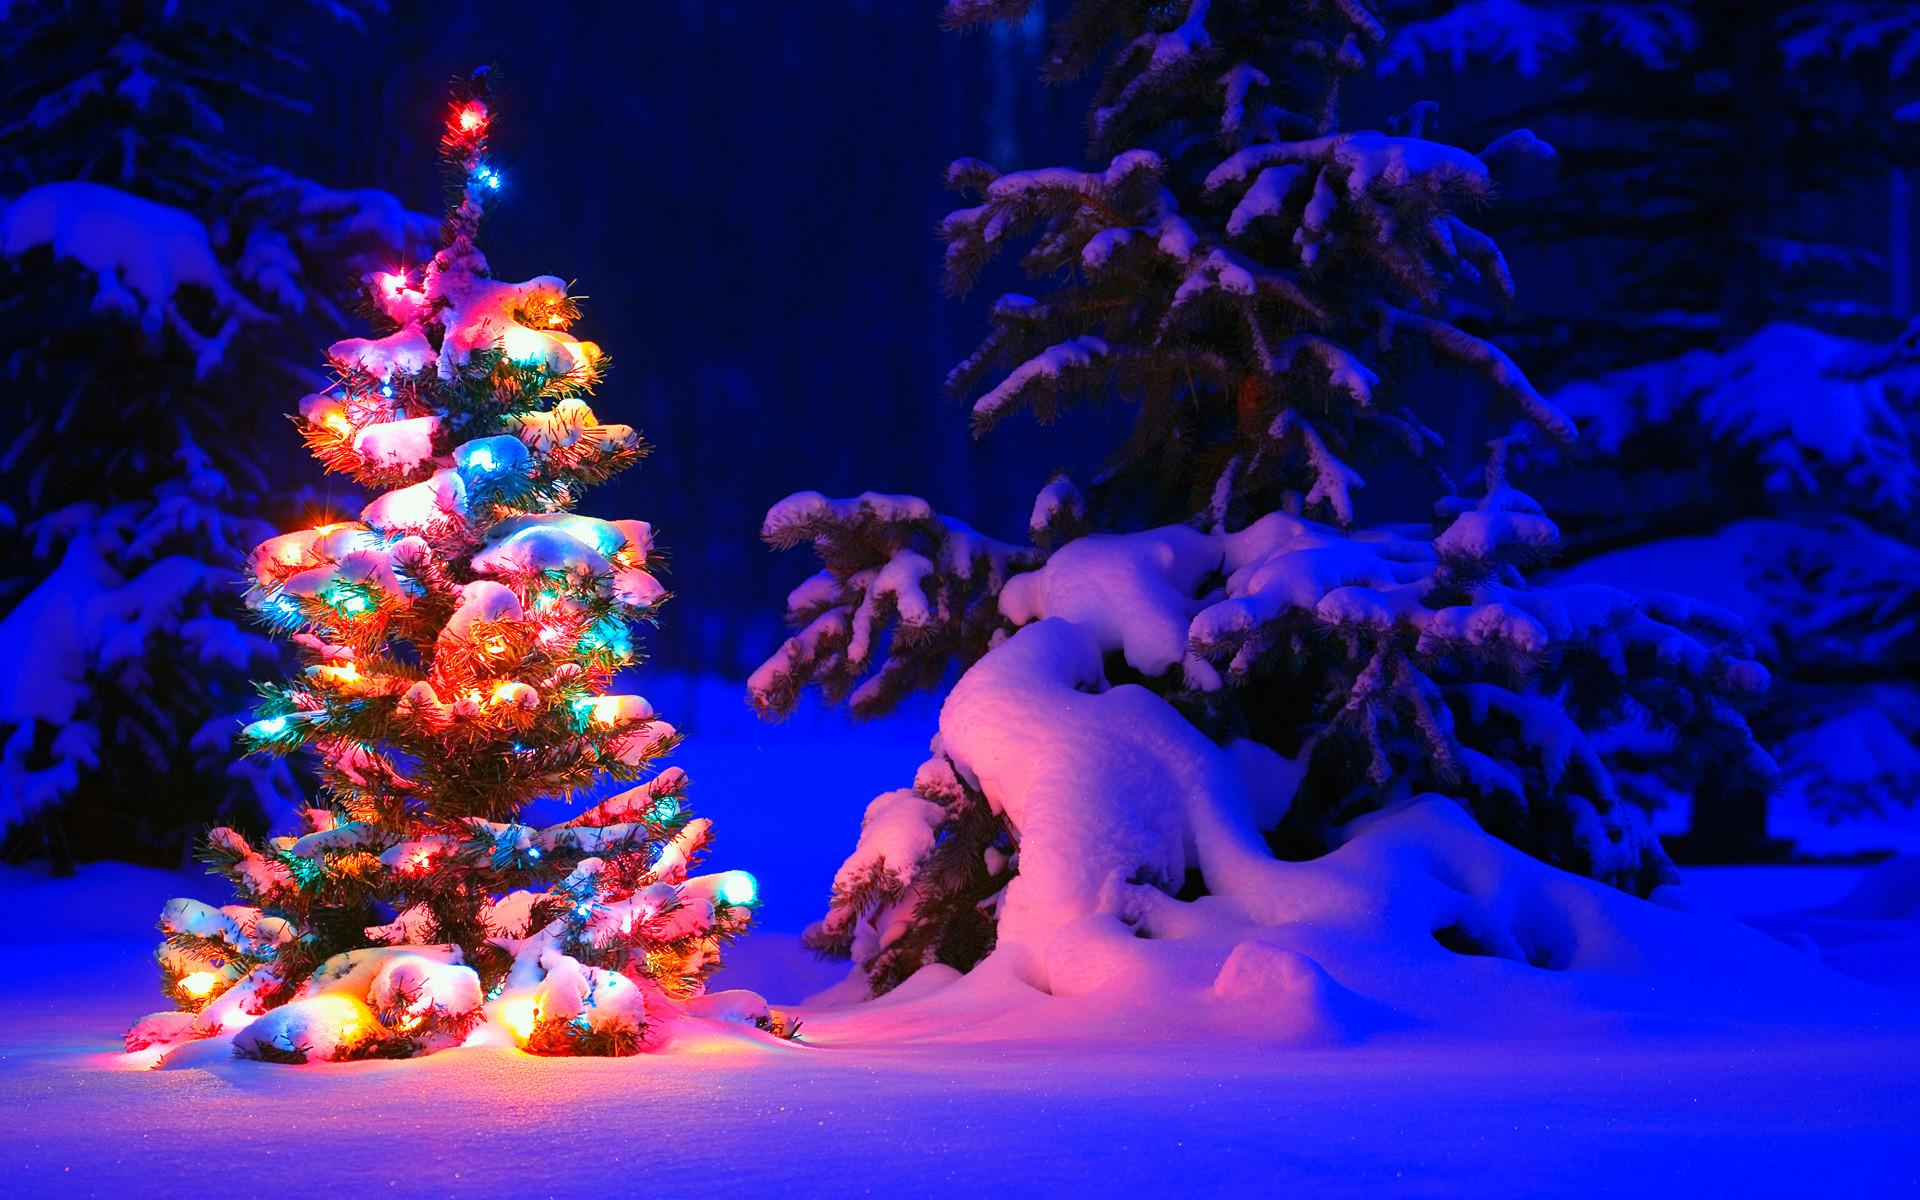 Snowy Christmas Tree Lights